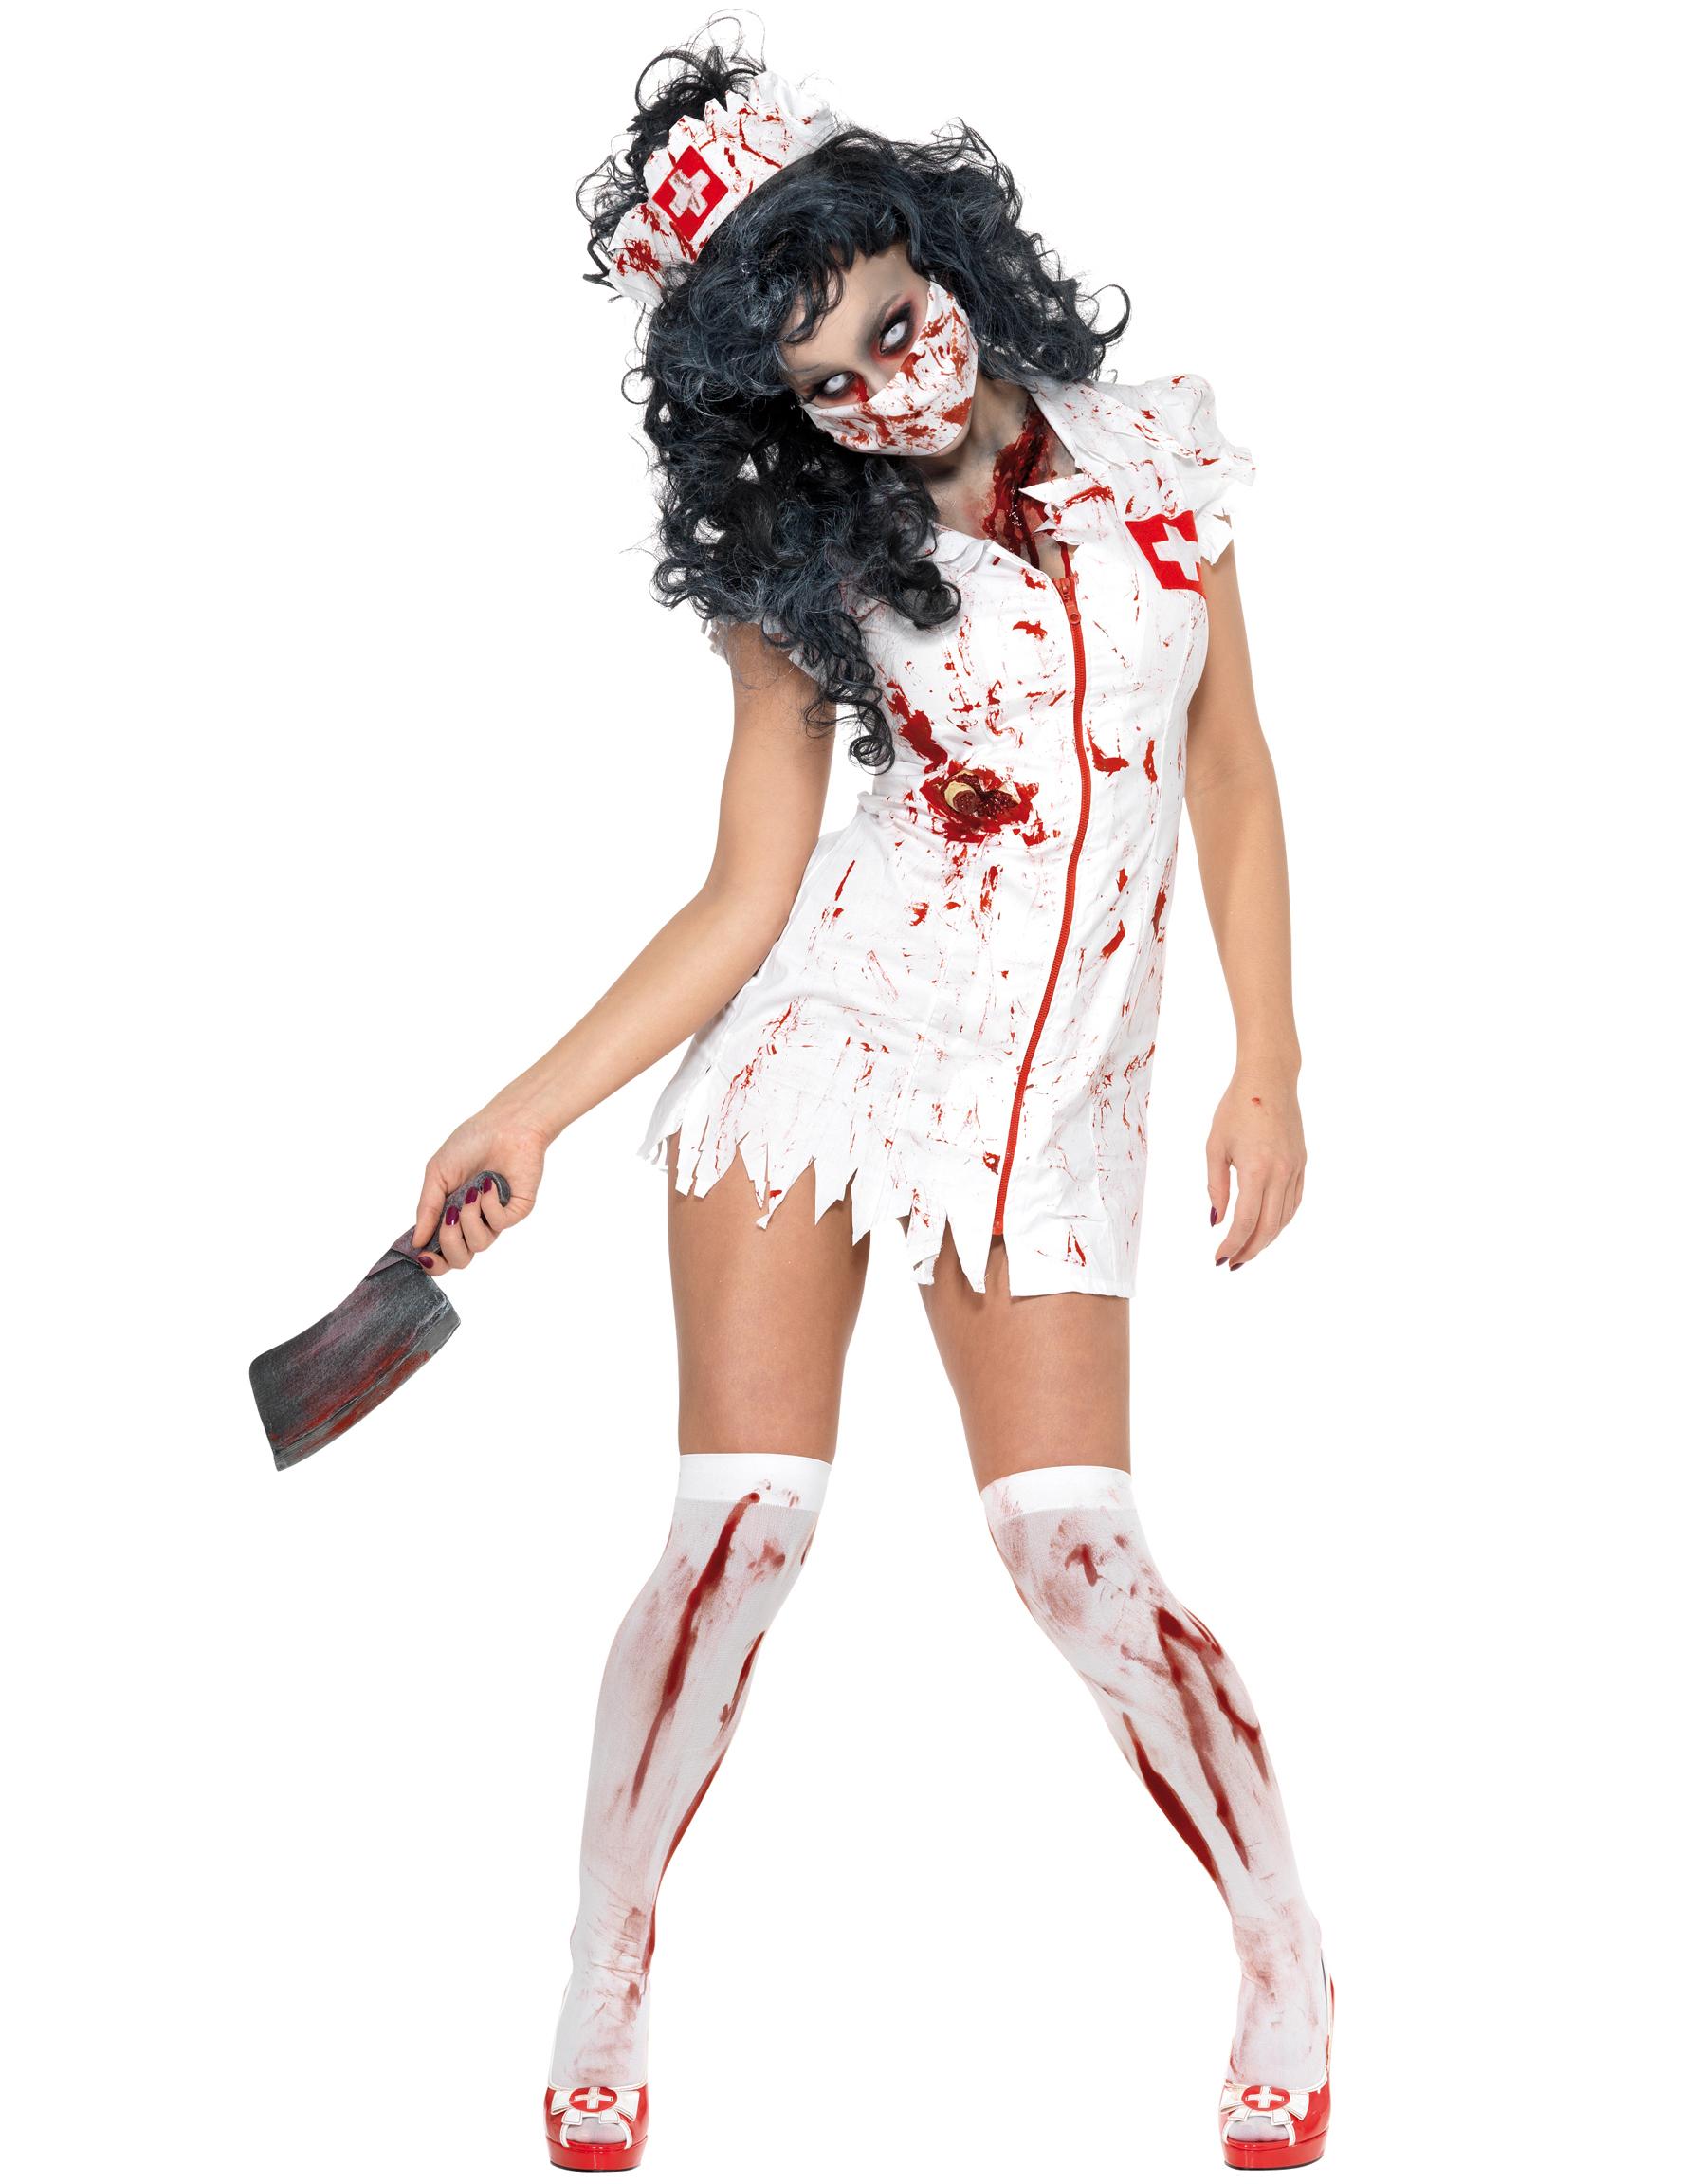 Deguisement Adulte Halloween A Faire Soi Meme.Deguisement Halloween Adulte